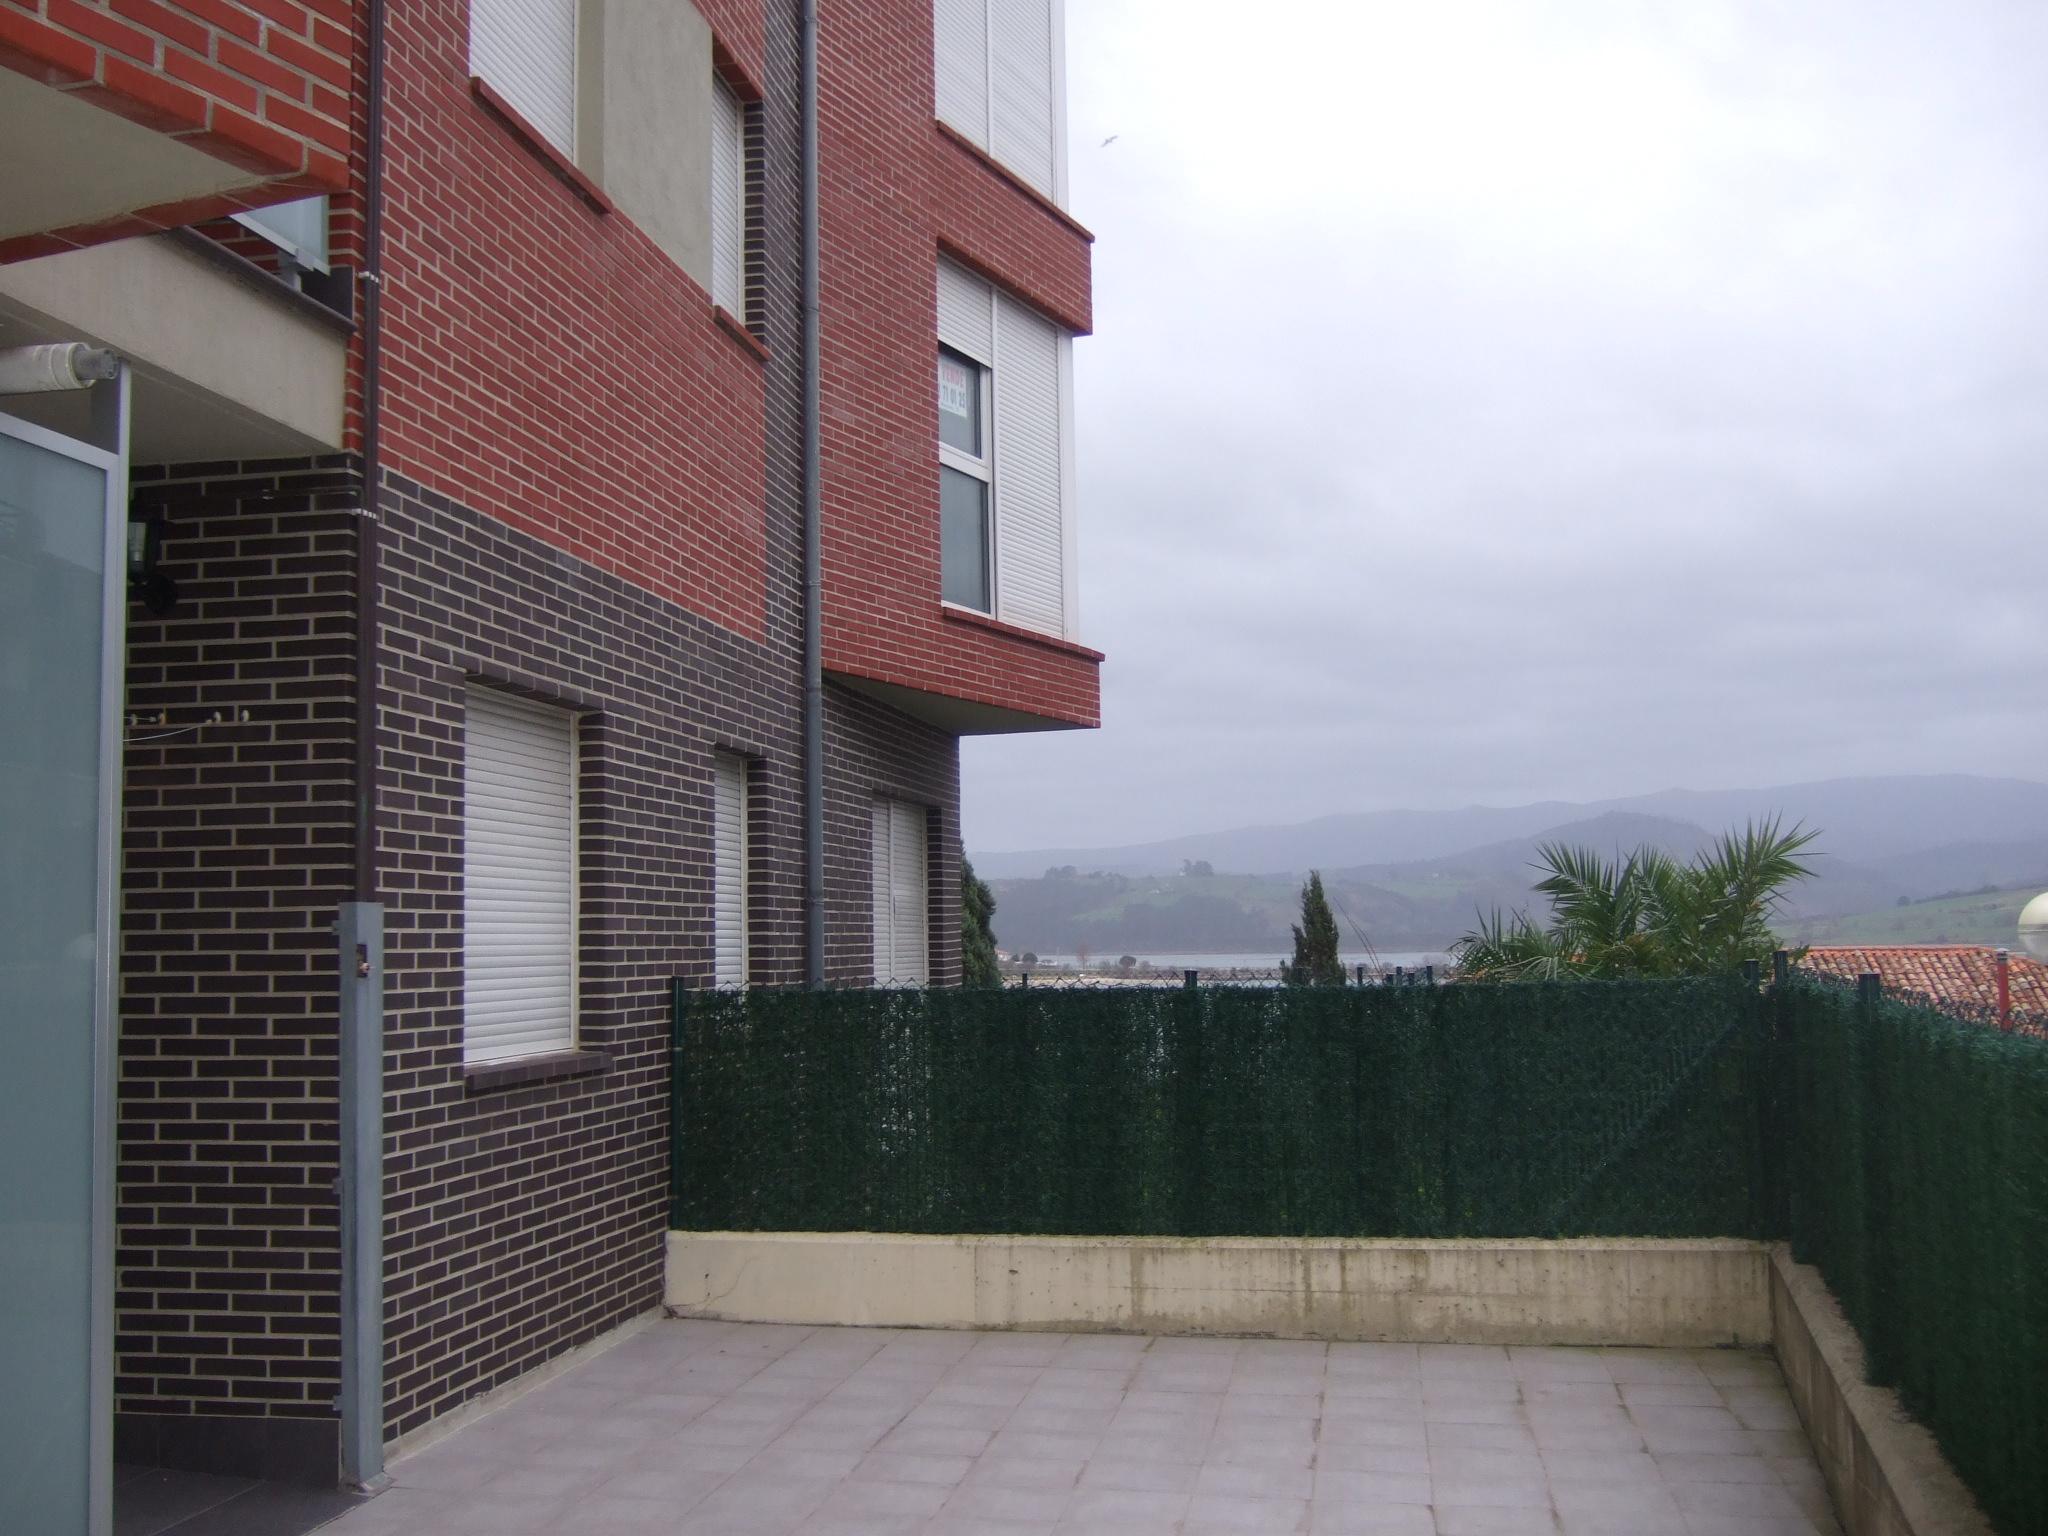 Alquiler de piso con parcela en san vicente de la for Pisos alquiler san vicente